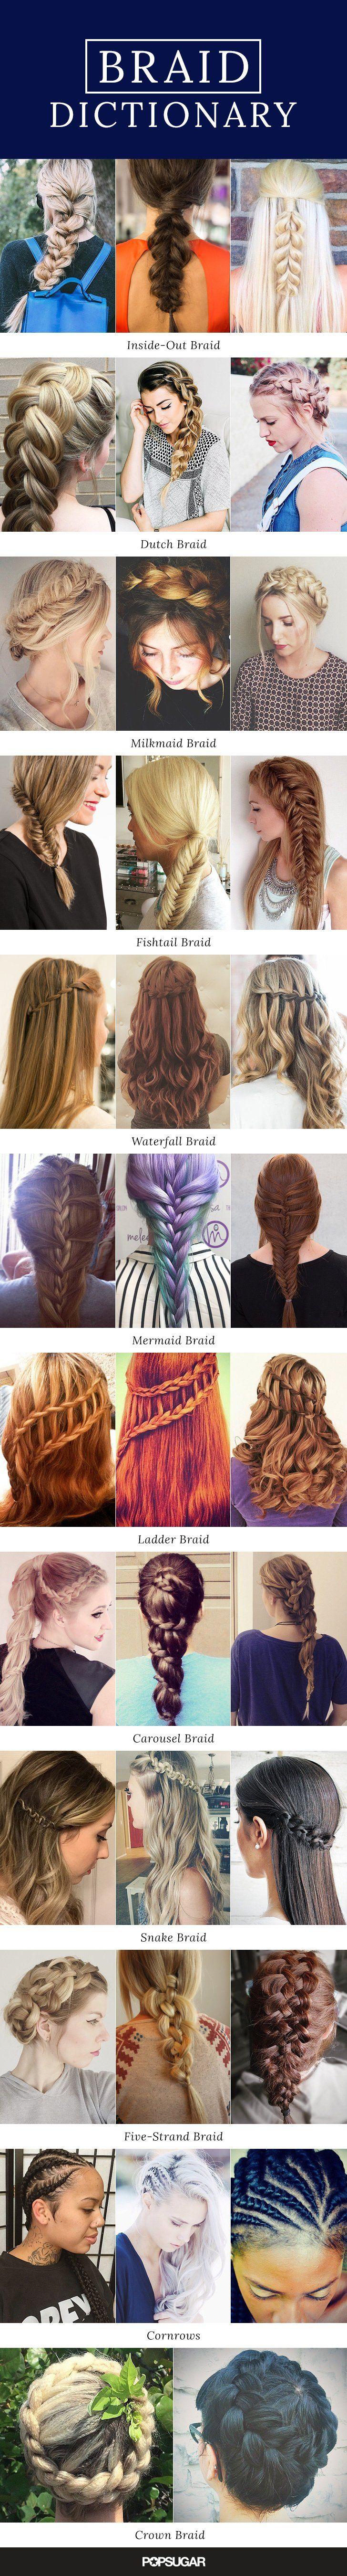 The most beautiful braids on Pinterest